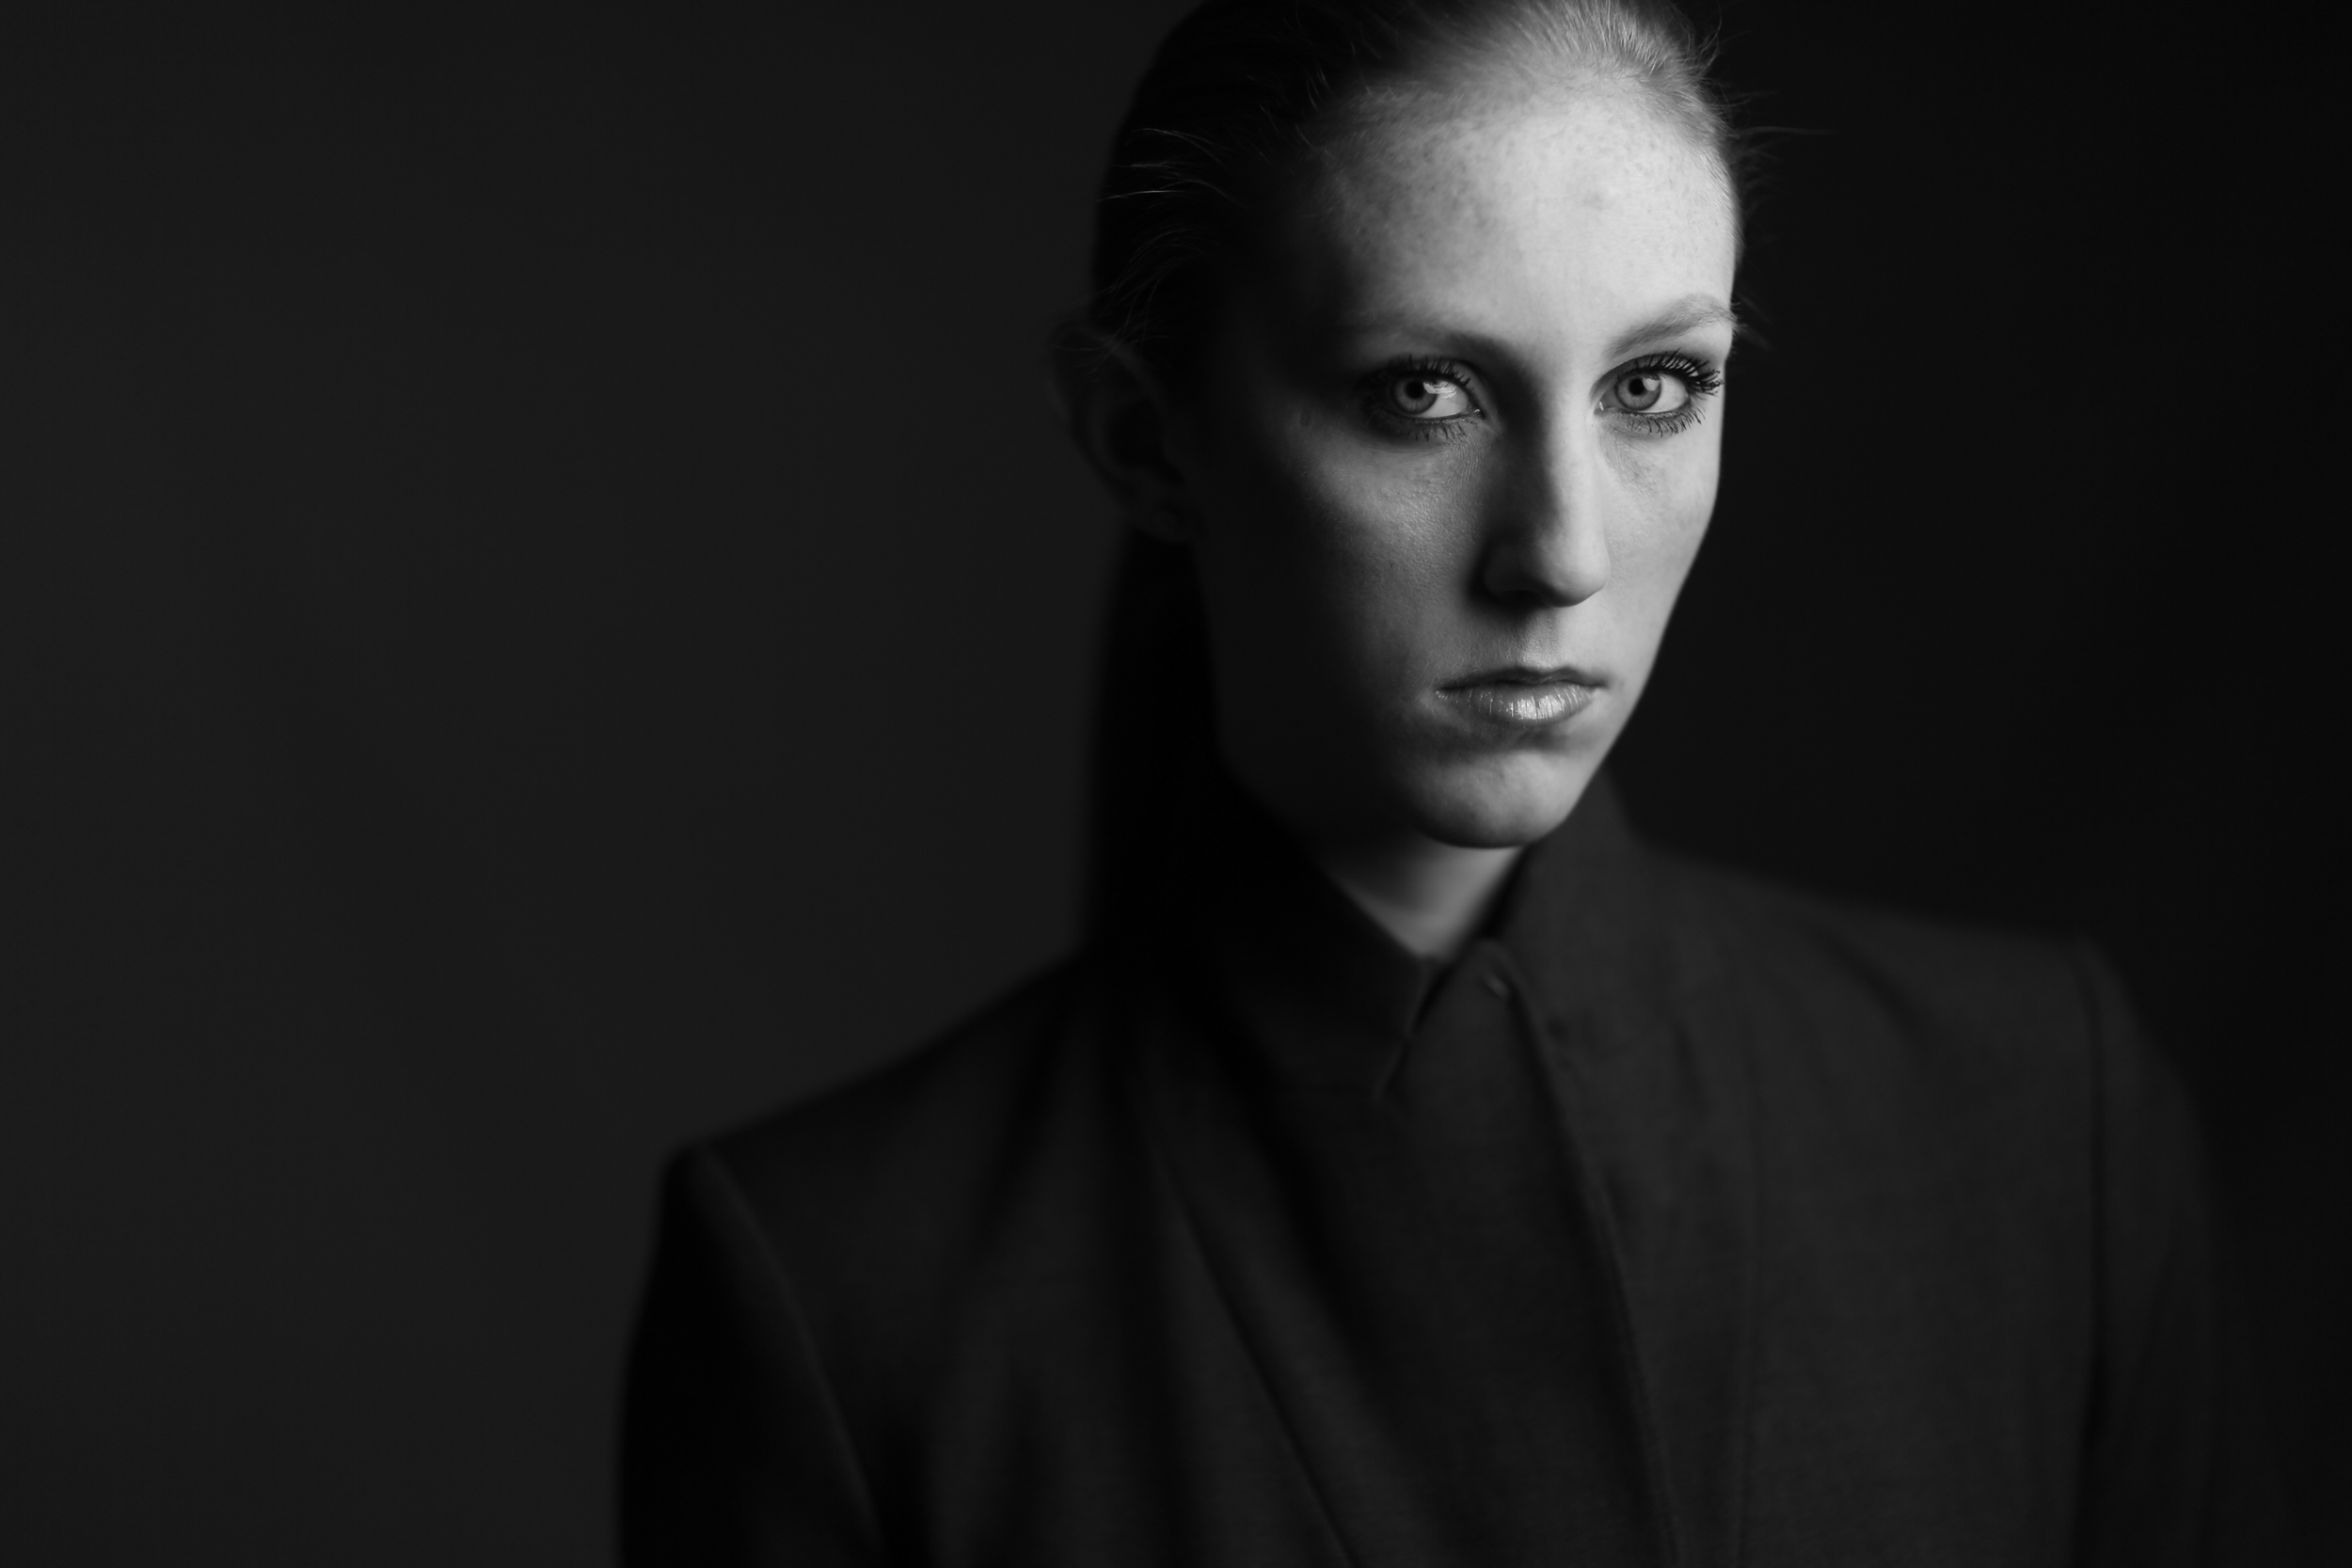 Photographer Daniel Norton